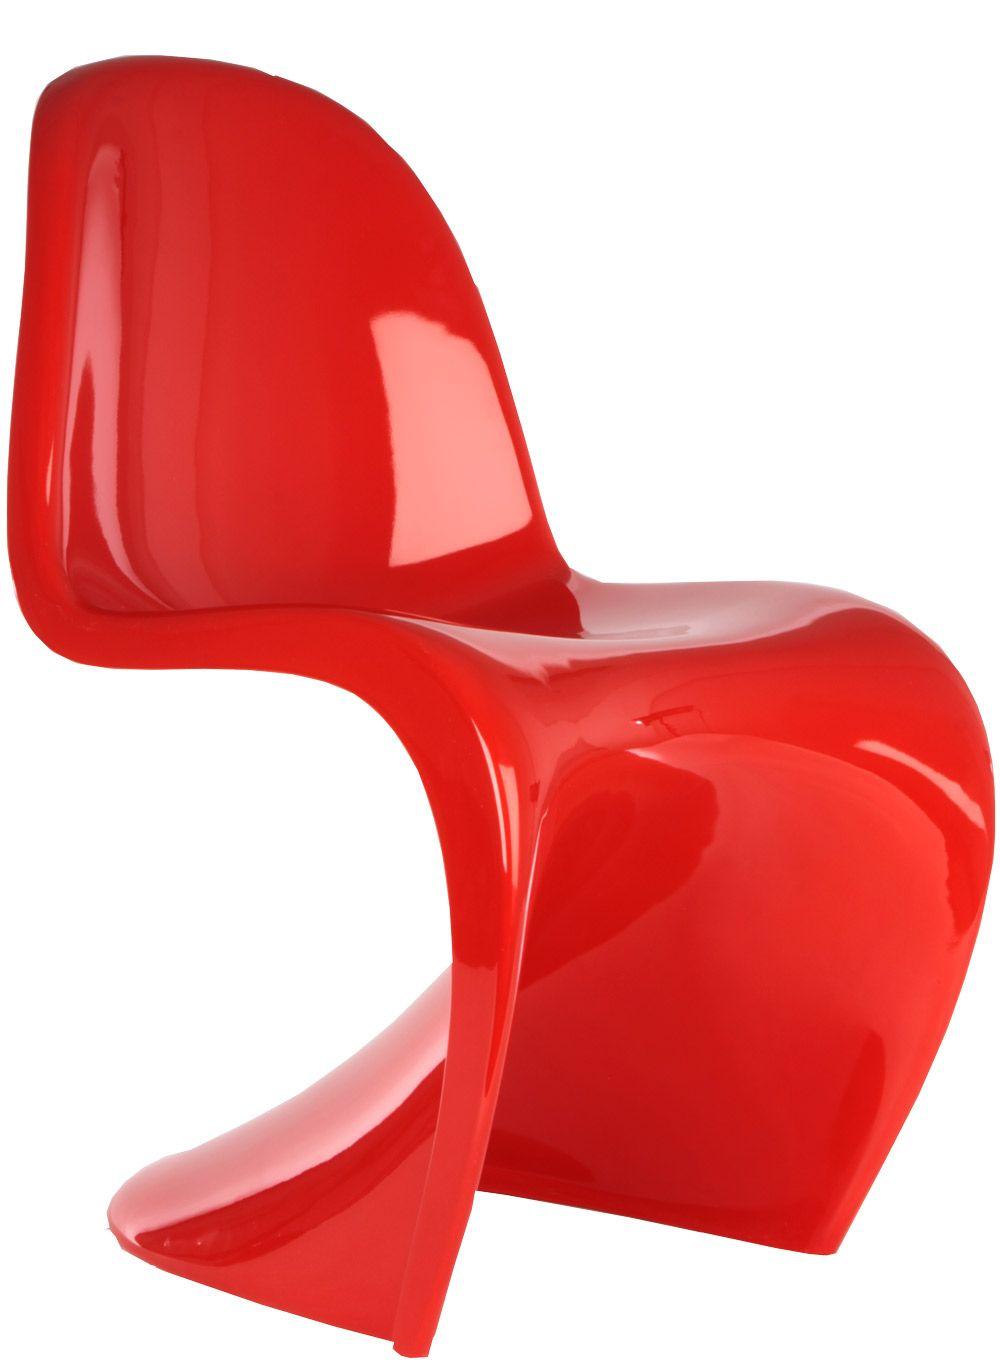 panton chair by verner panton 1959 1960 denmark. Black Bedroom Furniture Sets. Home Design Ideas